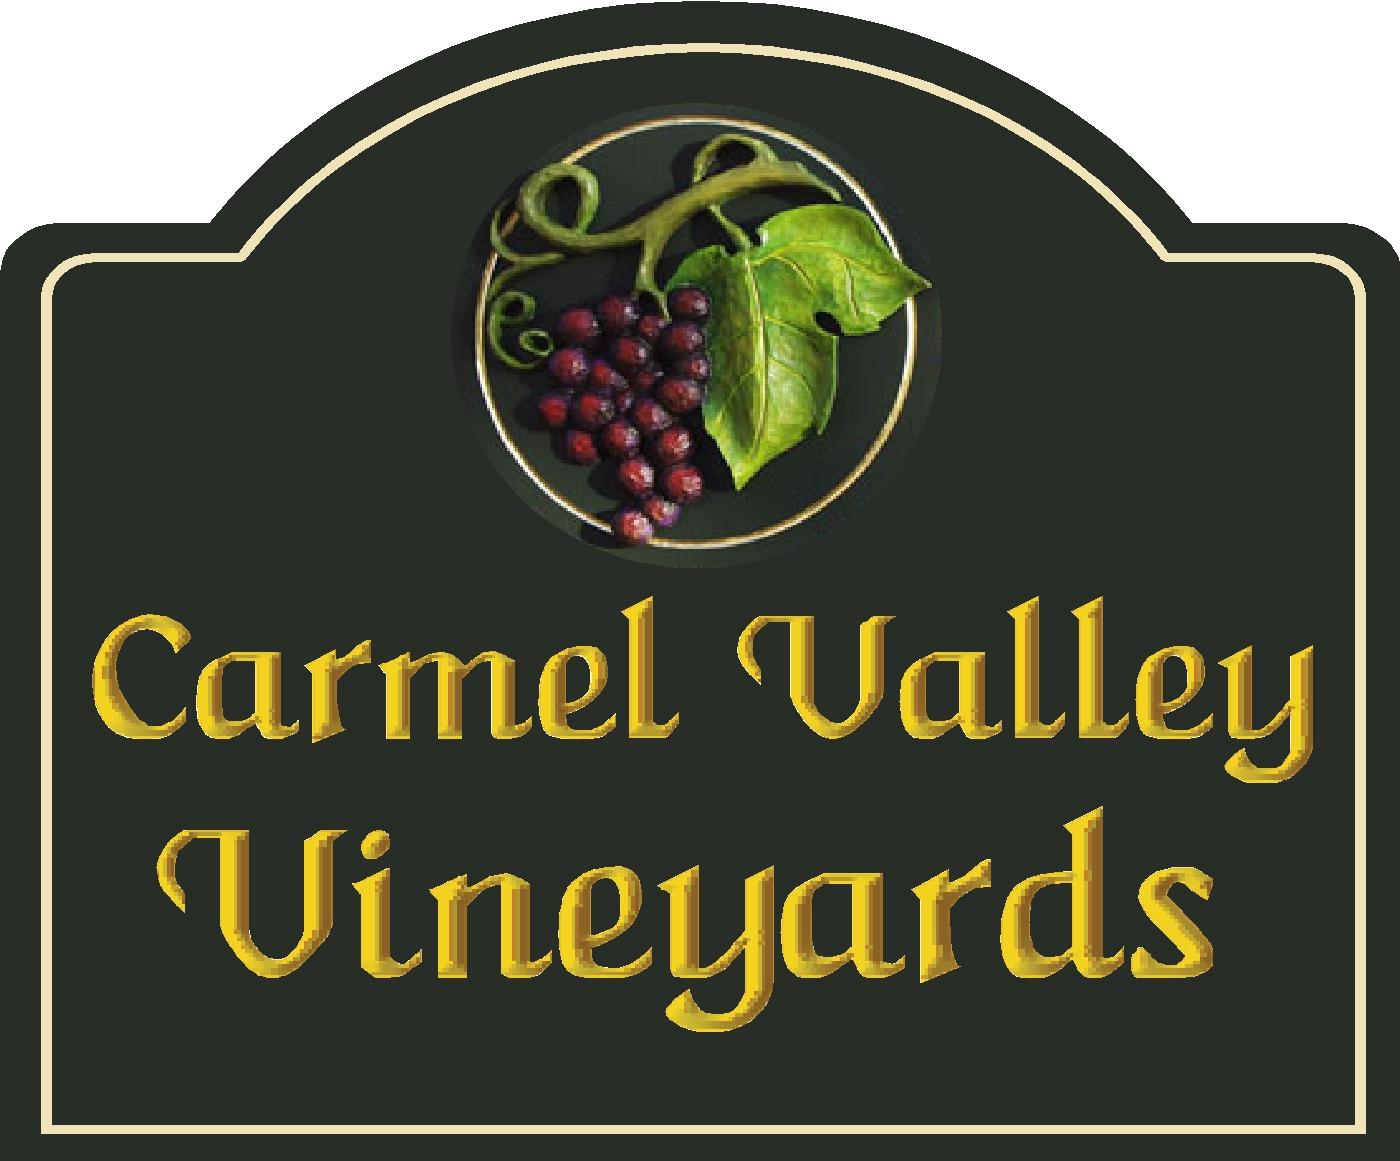 R27068 - Carved Carmel Valley Vineyards Entrance Sign, with 3D Grape Cluster